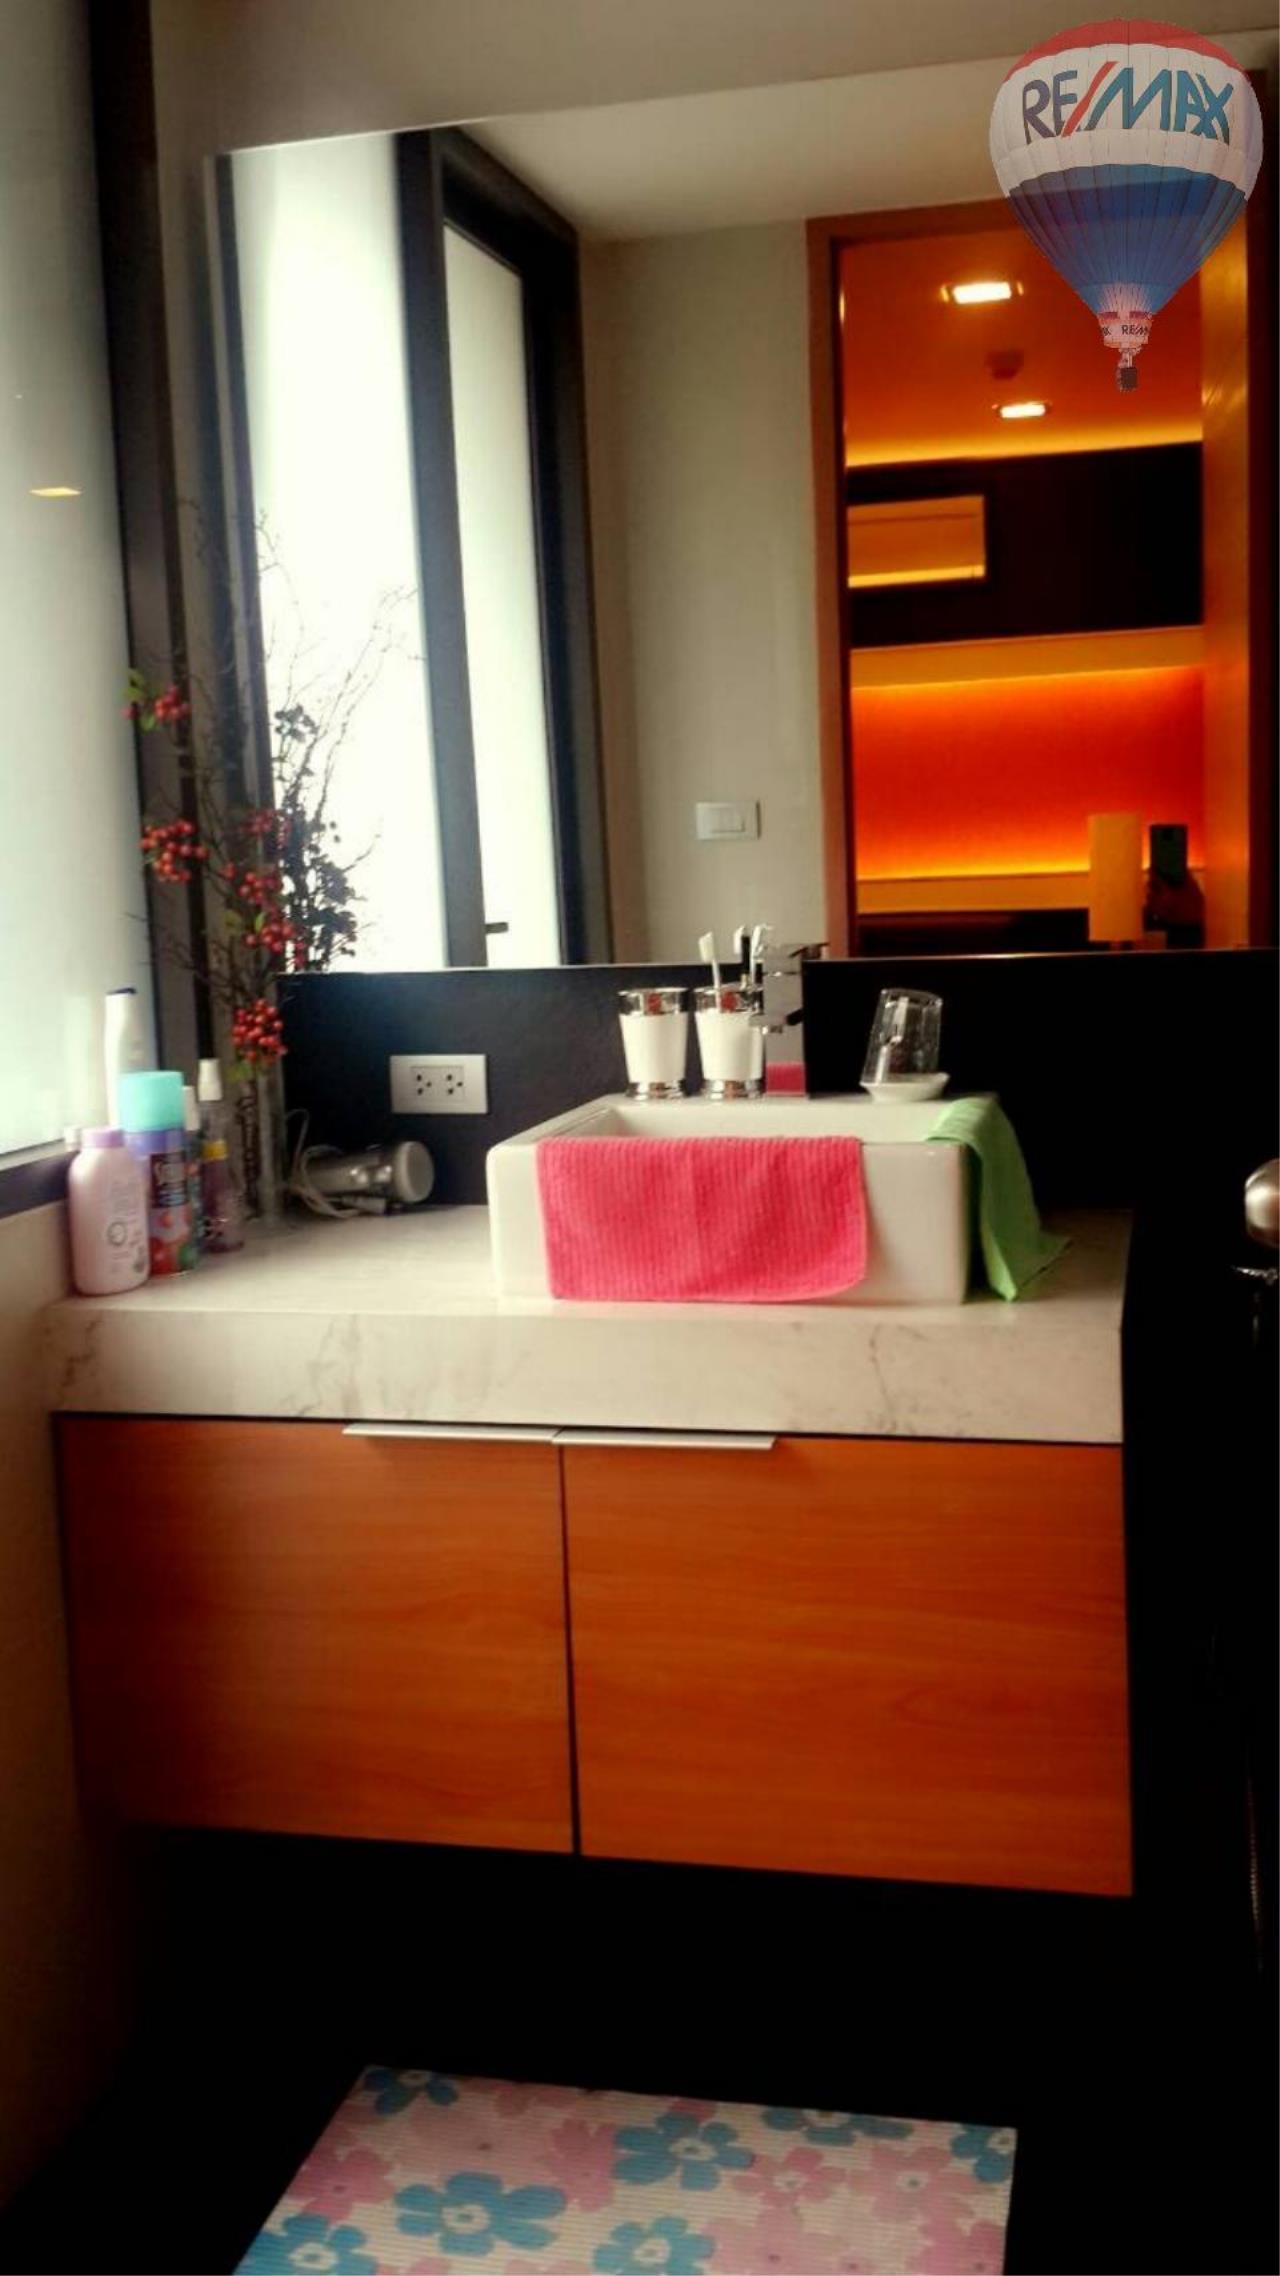 RE/MAX Properties Agency's 1 Bedroom 38 Sq.M. for renting in XVI Condominium 7